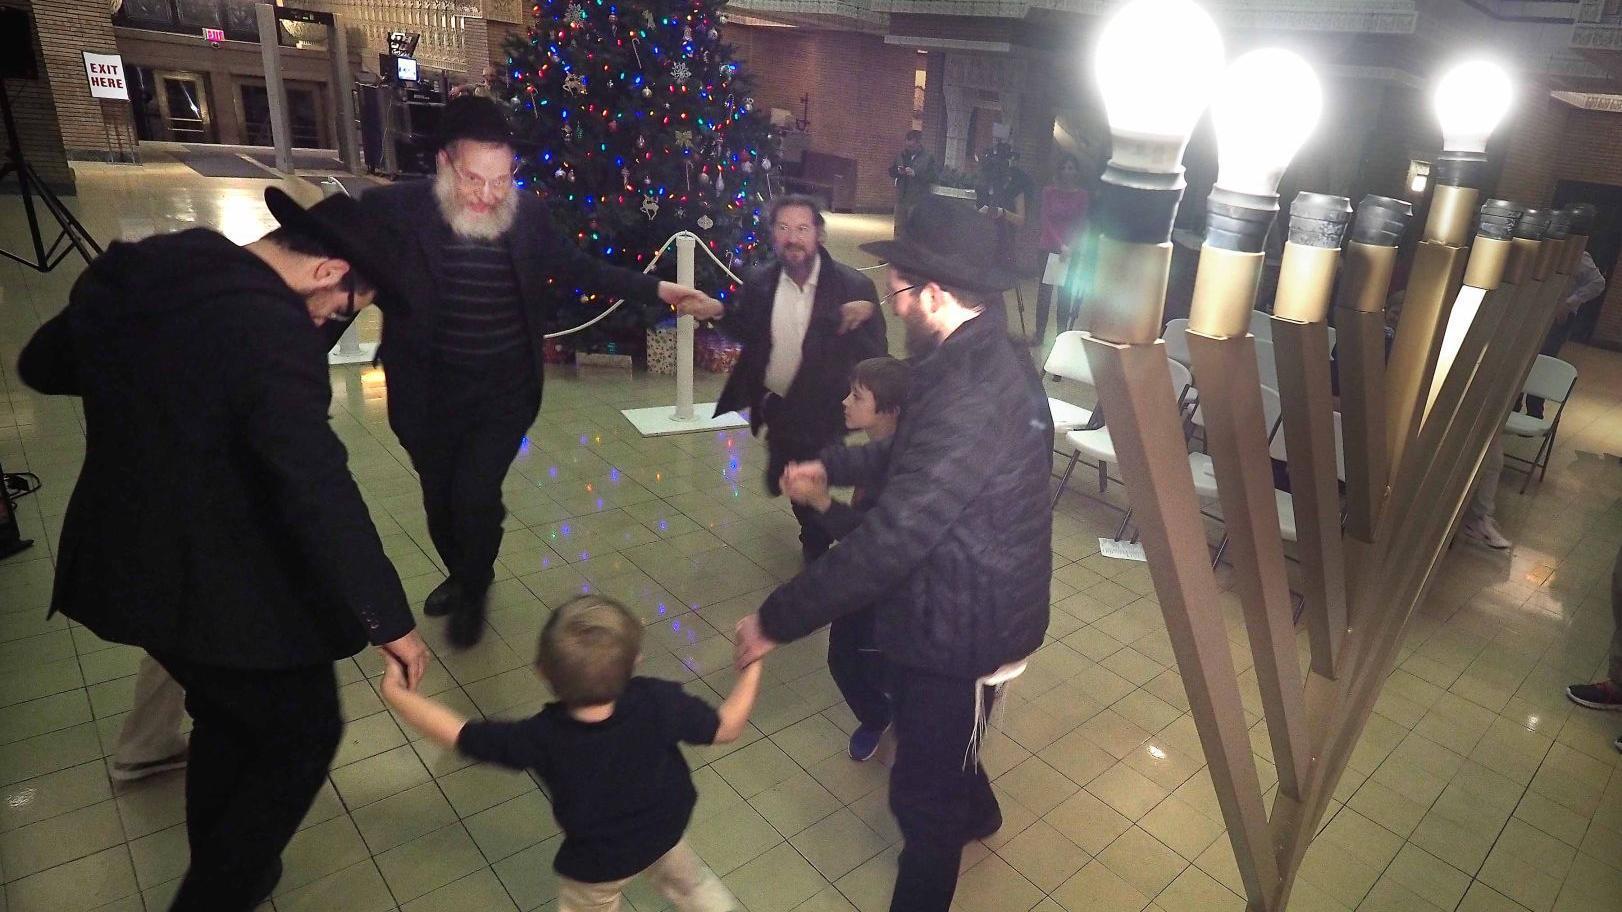 Jewish community celebrates lighting of menorah